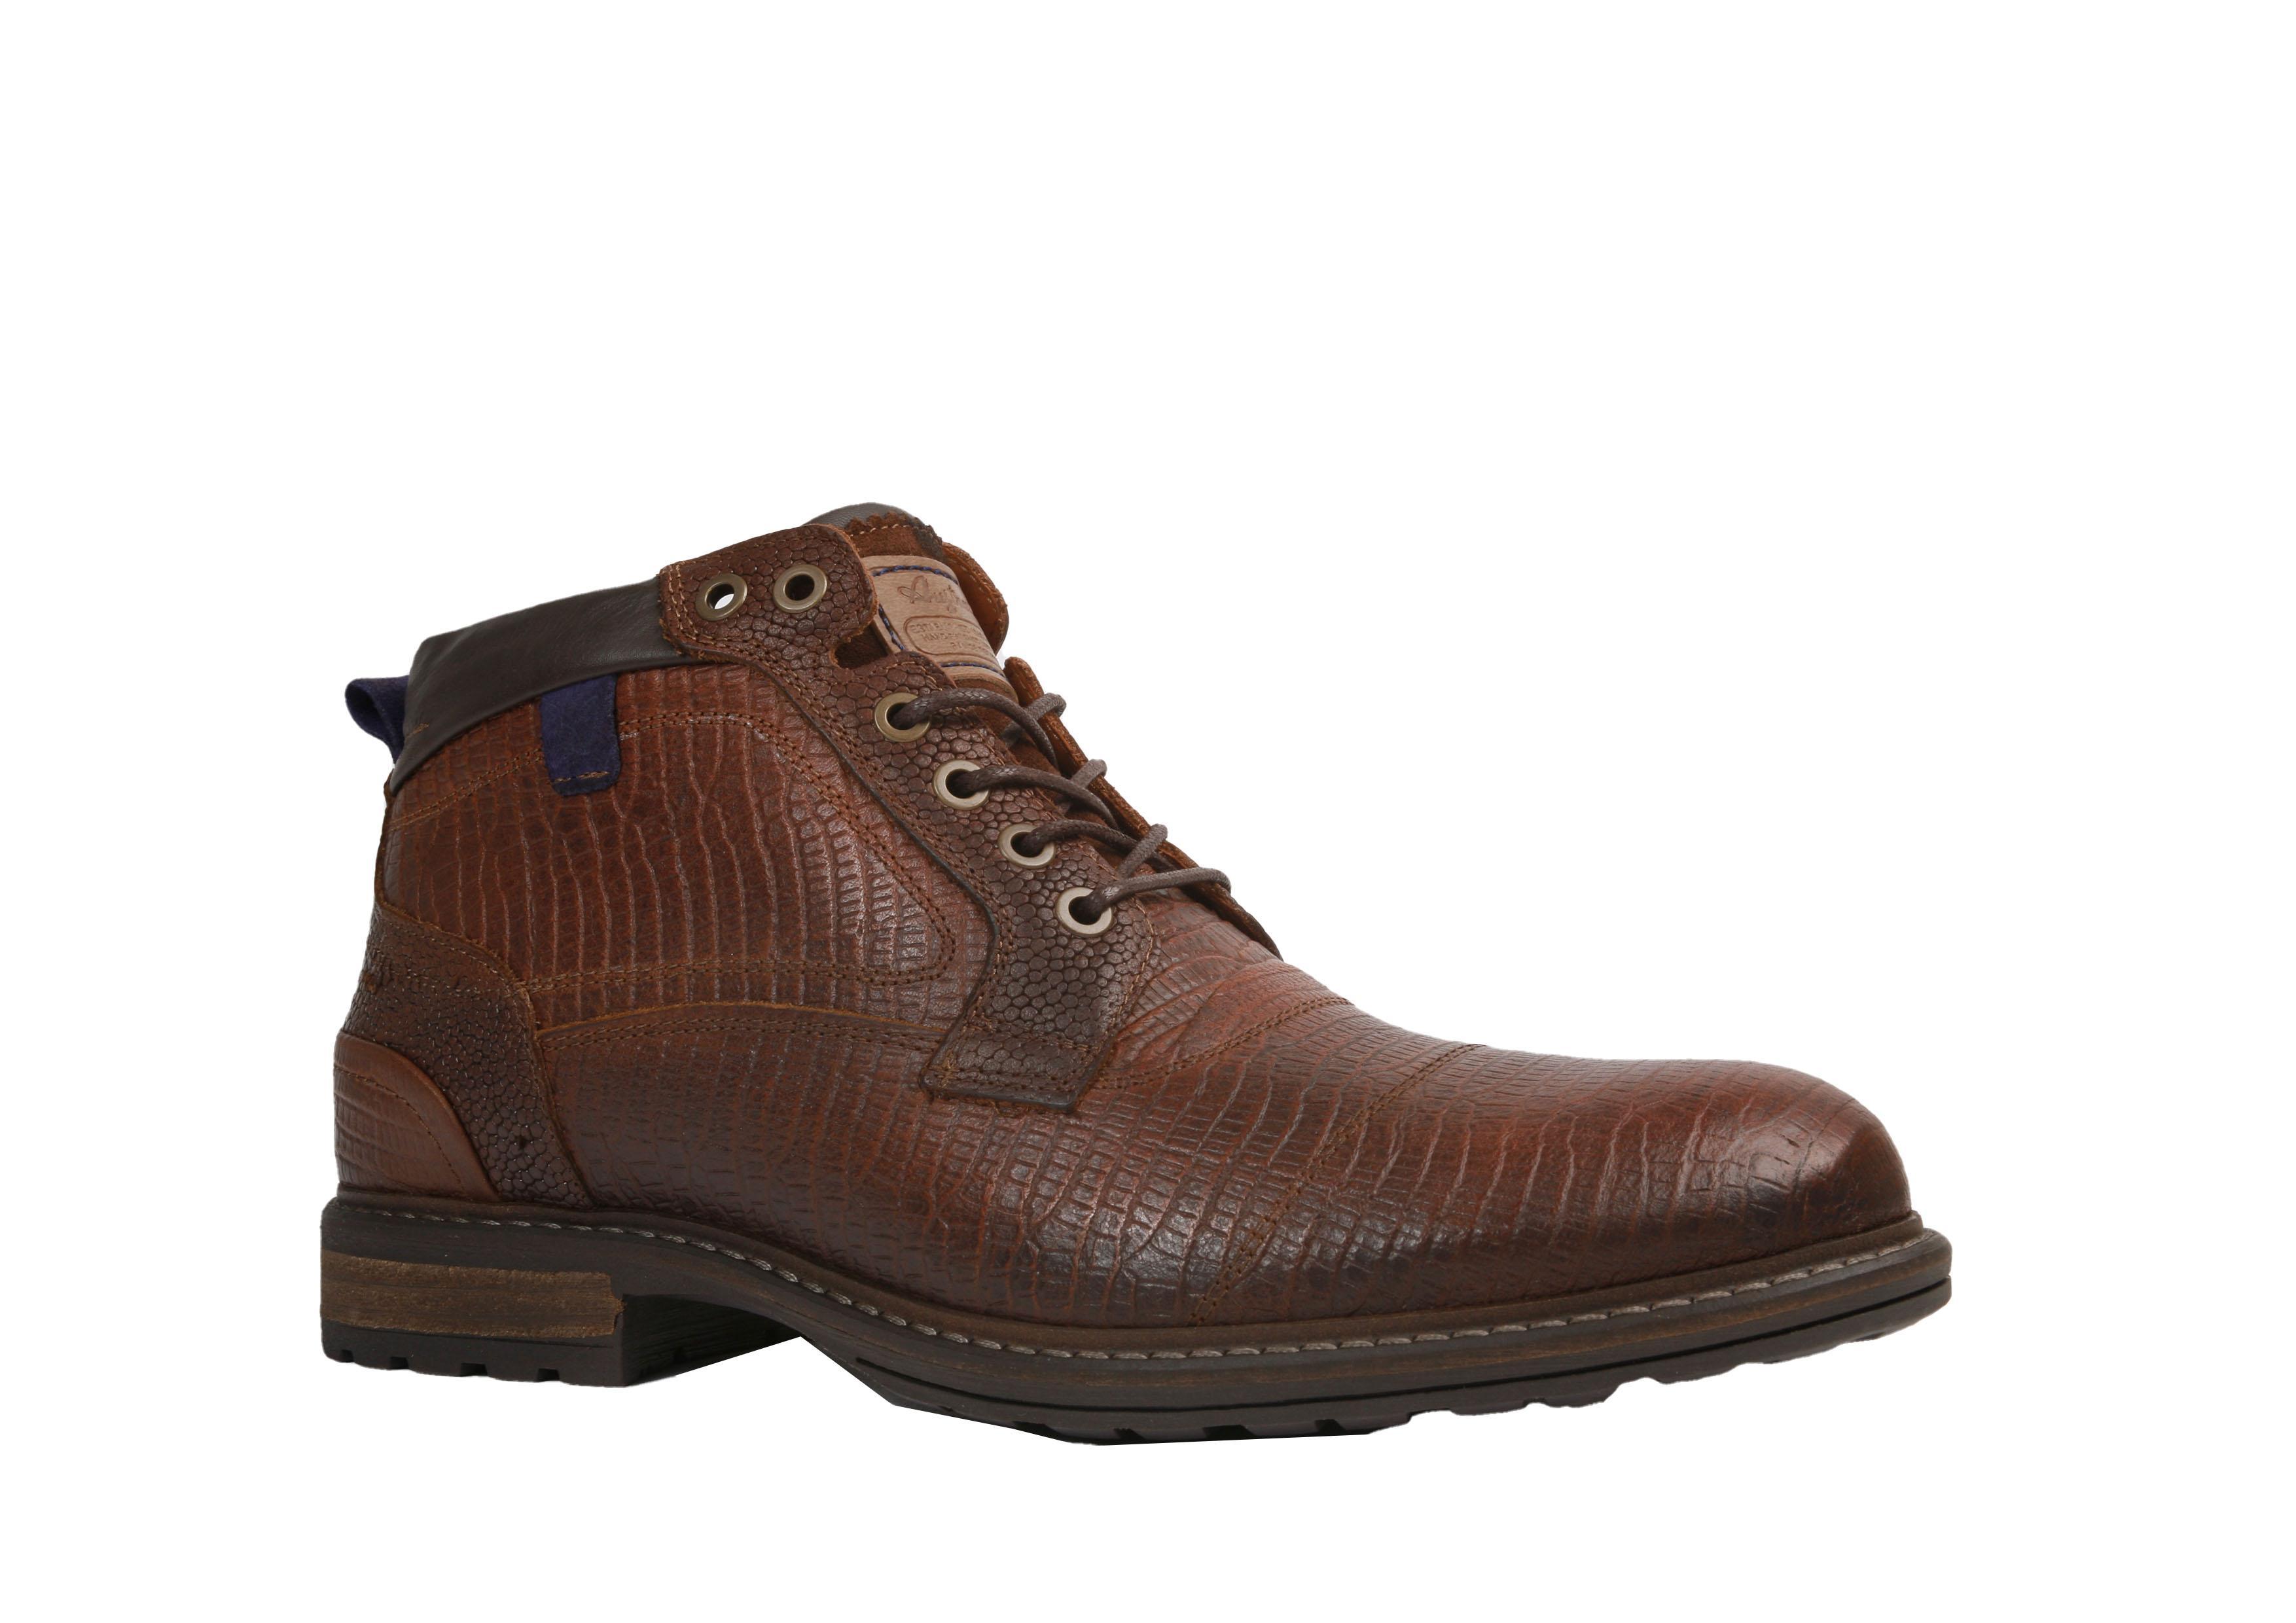 Australian Footwear Artikelnummer Montenero Sportief/Geklede Boots Cognac